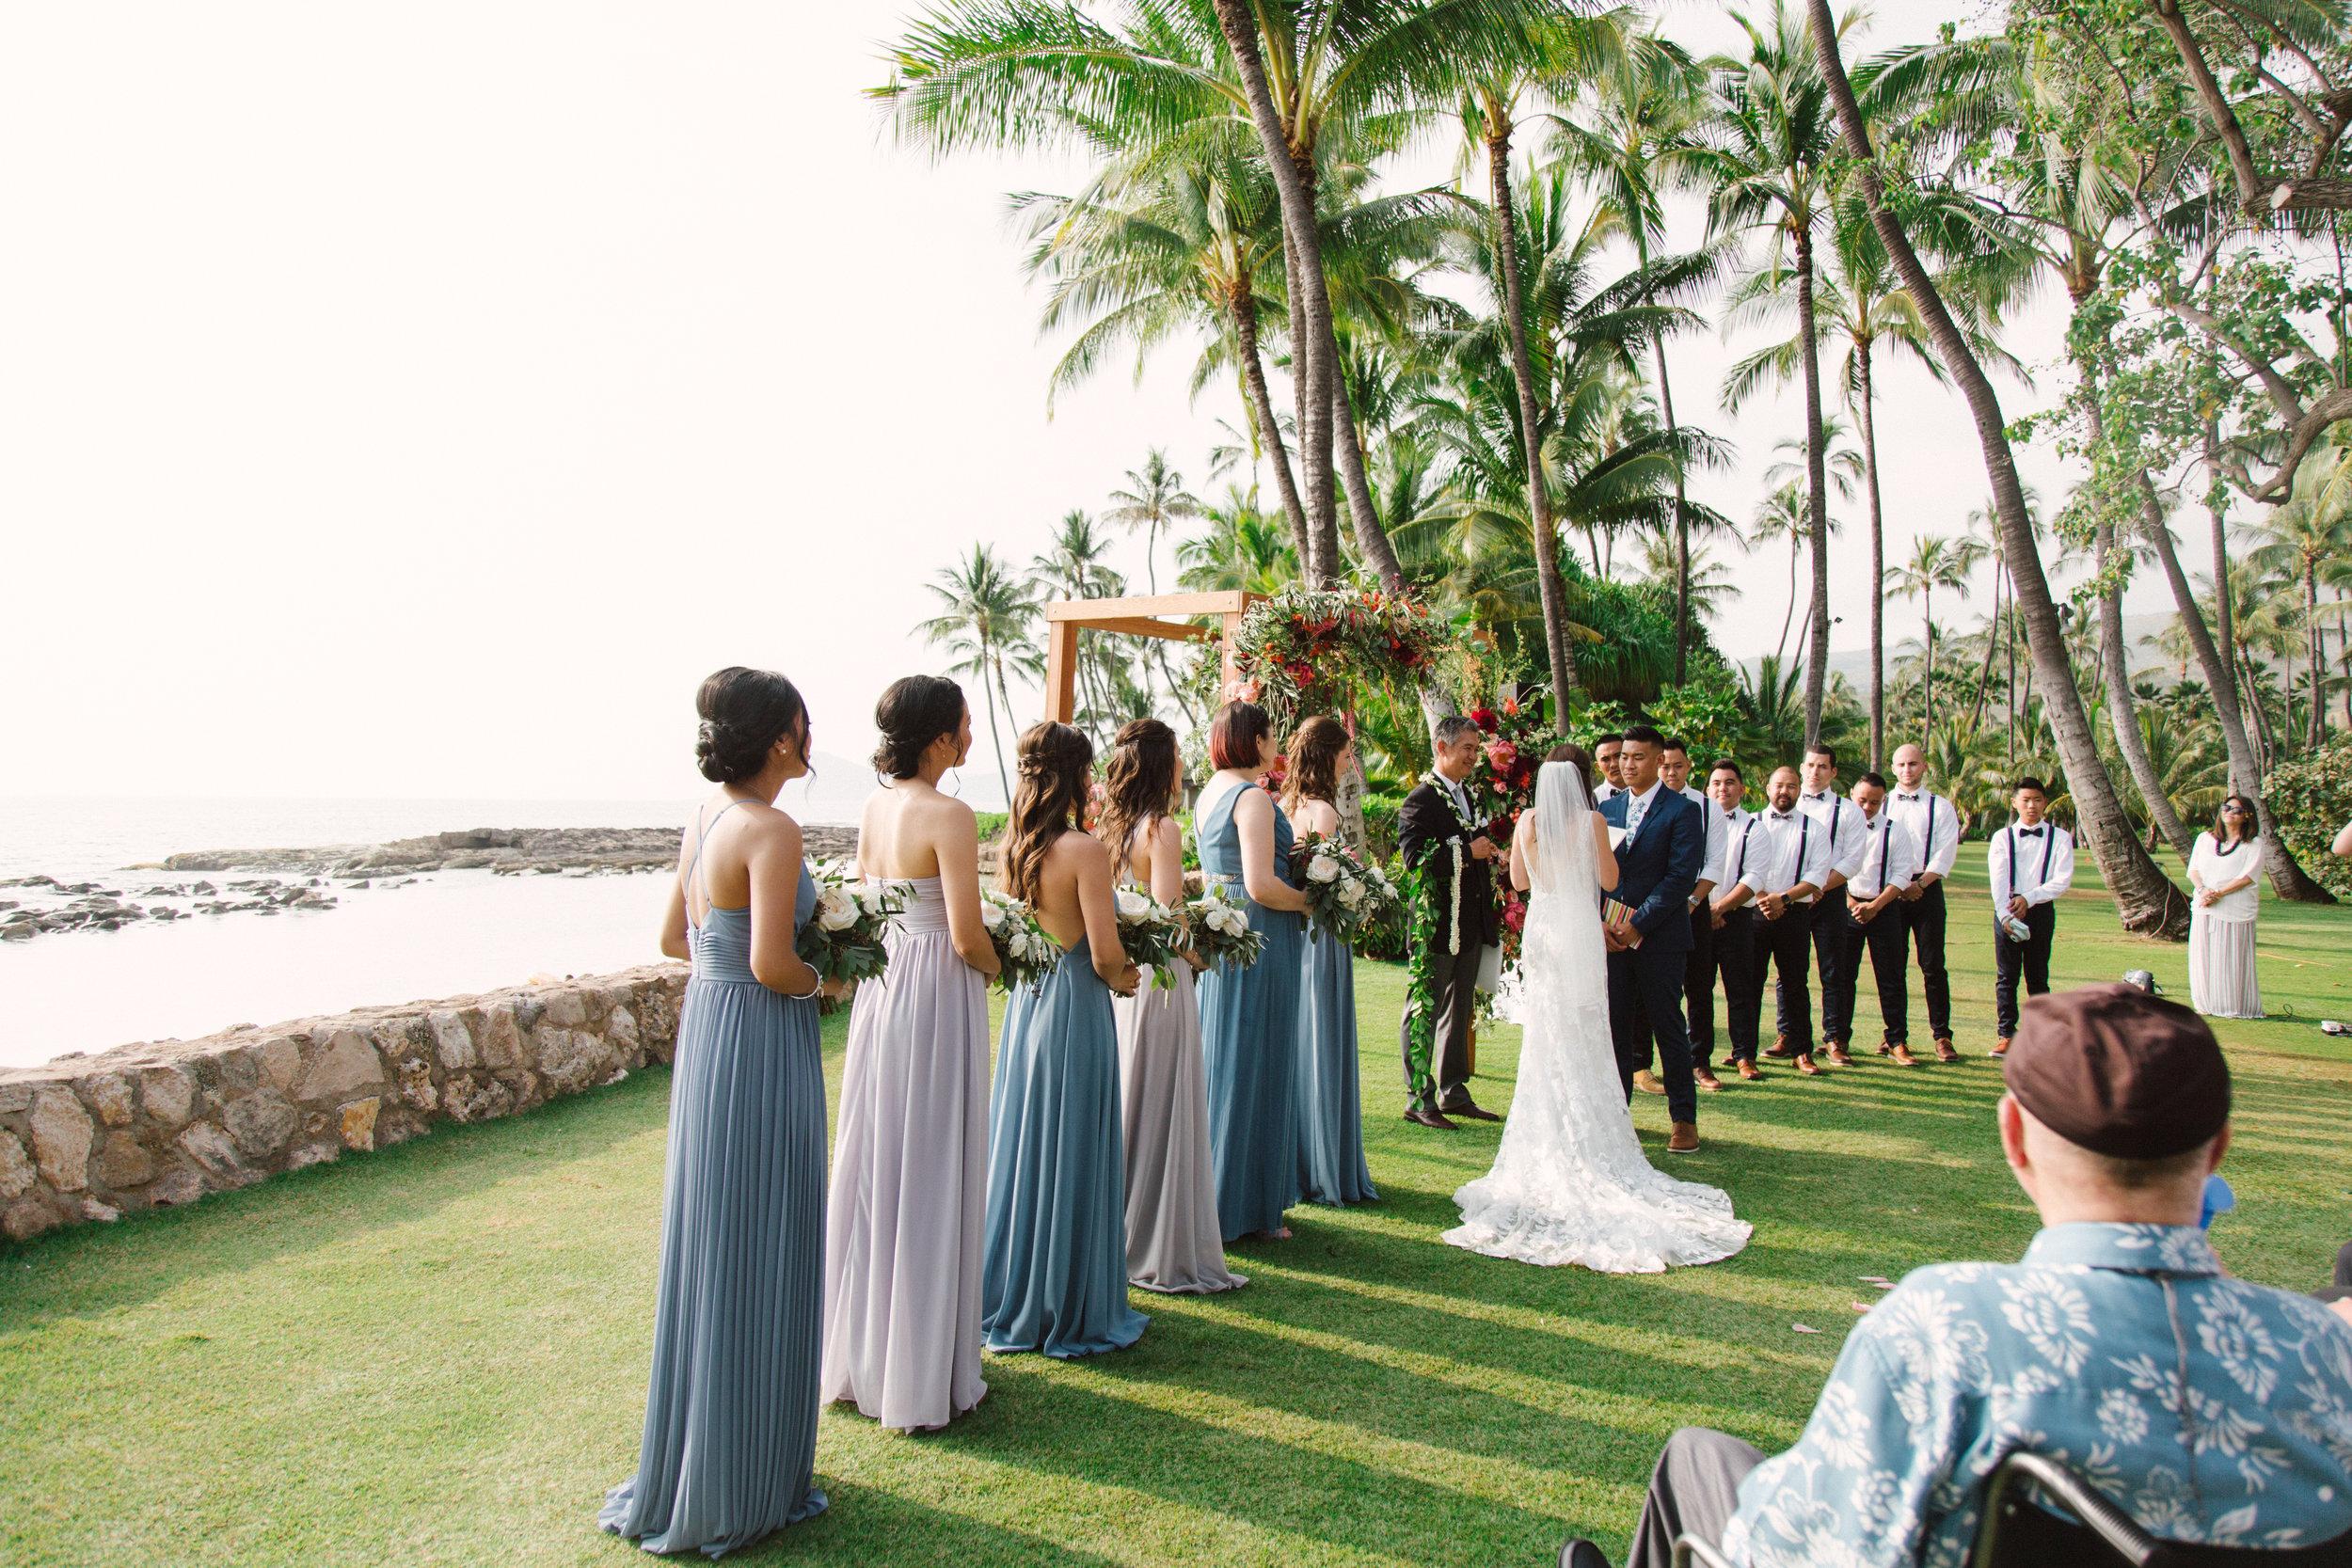 Brett and Jessica's wedding